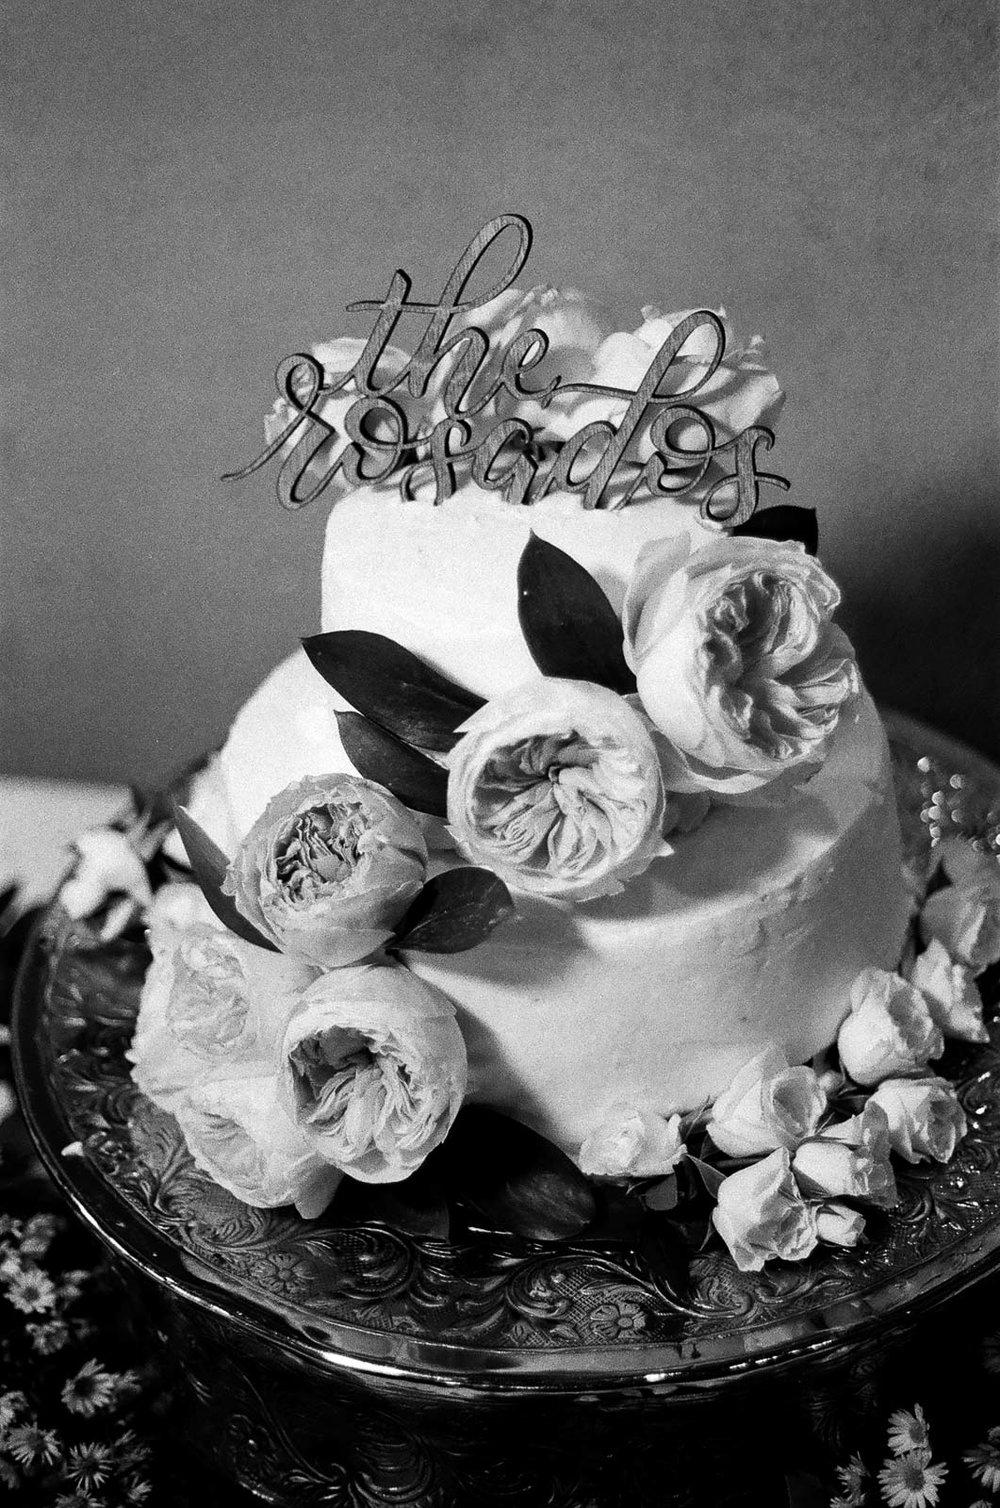 black and white 35mm film Photograph of Wedding cake taken by Joseph Barber wedding photography newport beach